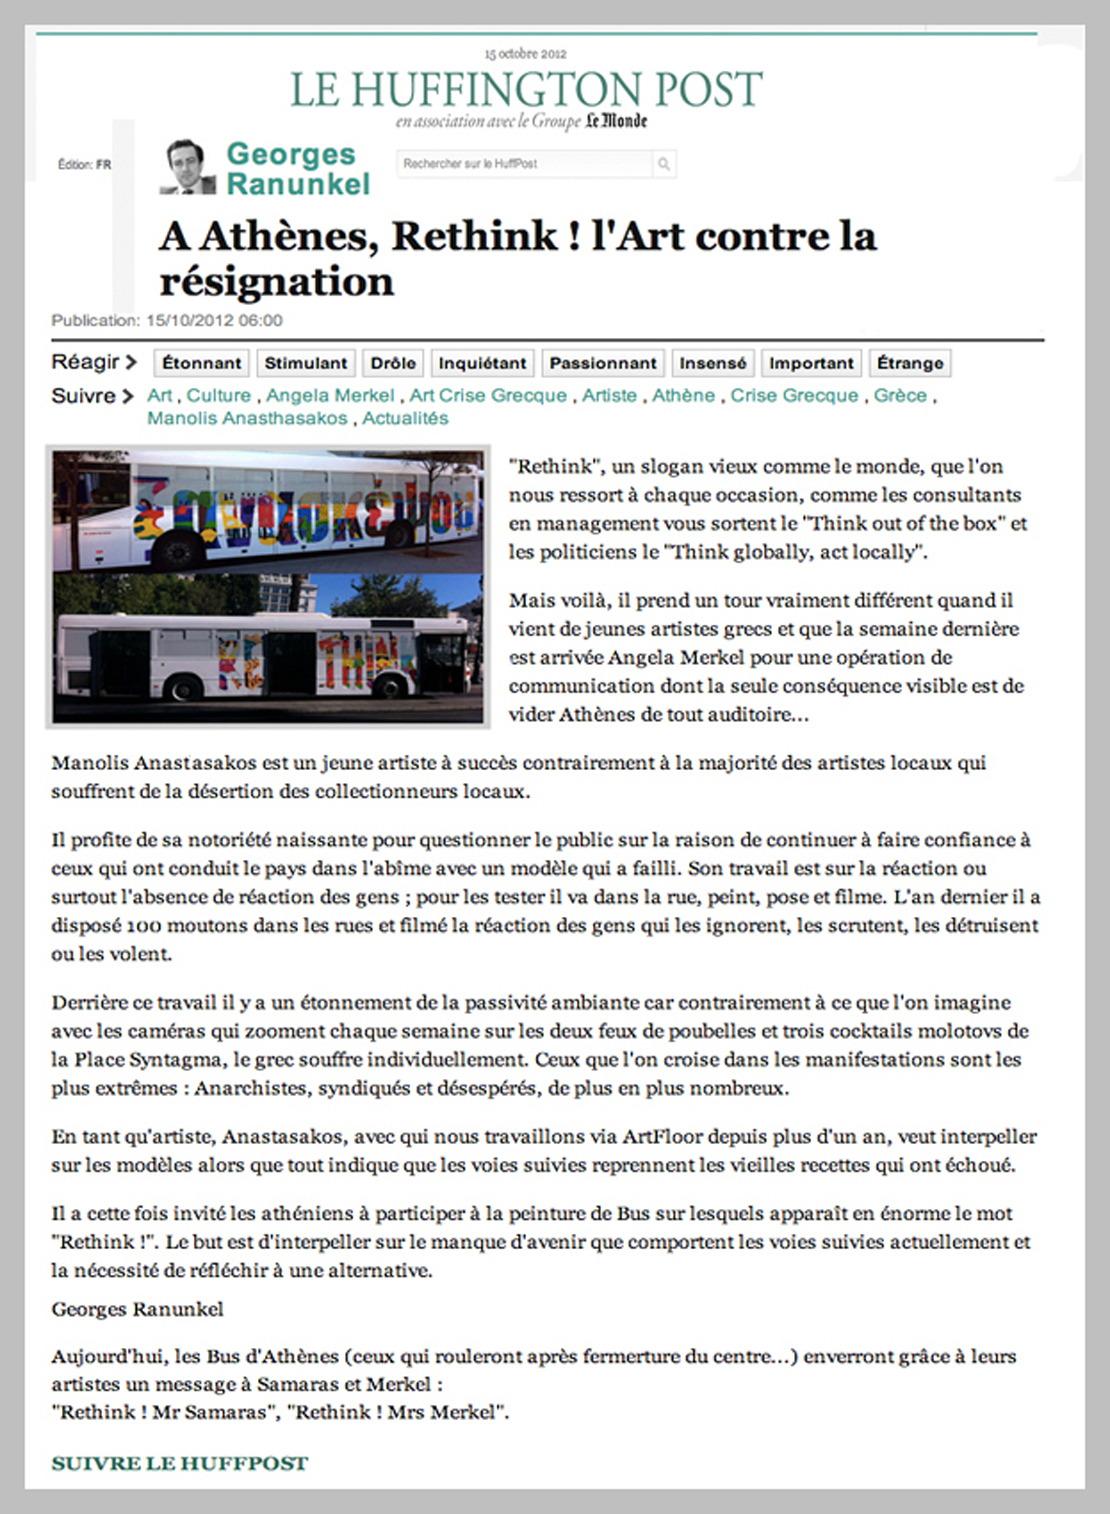 Le Huffington Post 2012